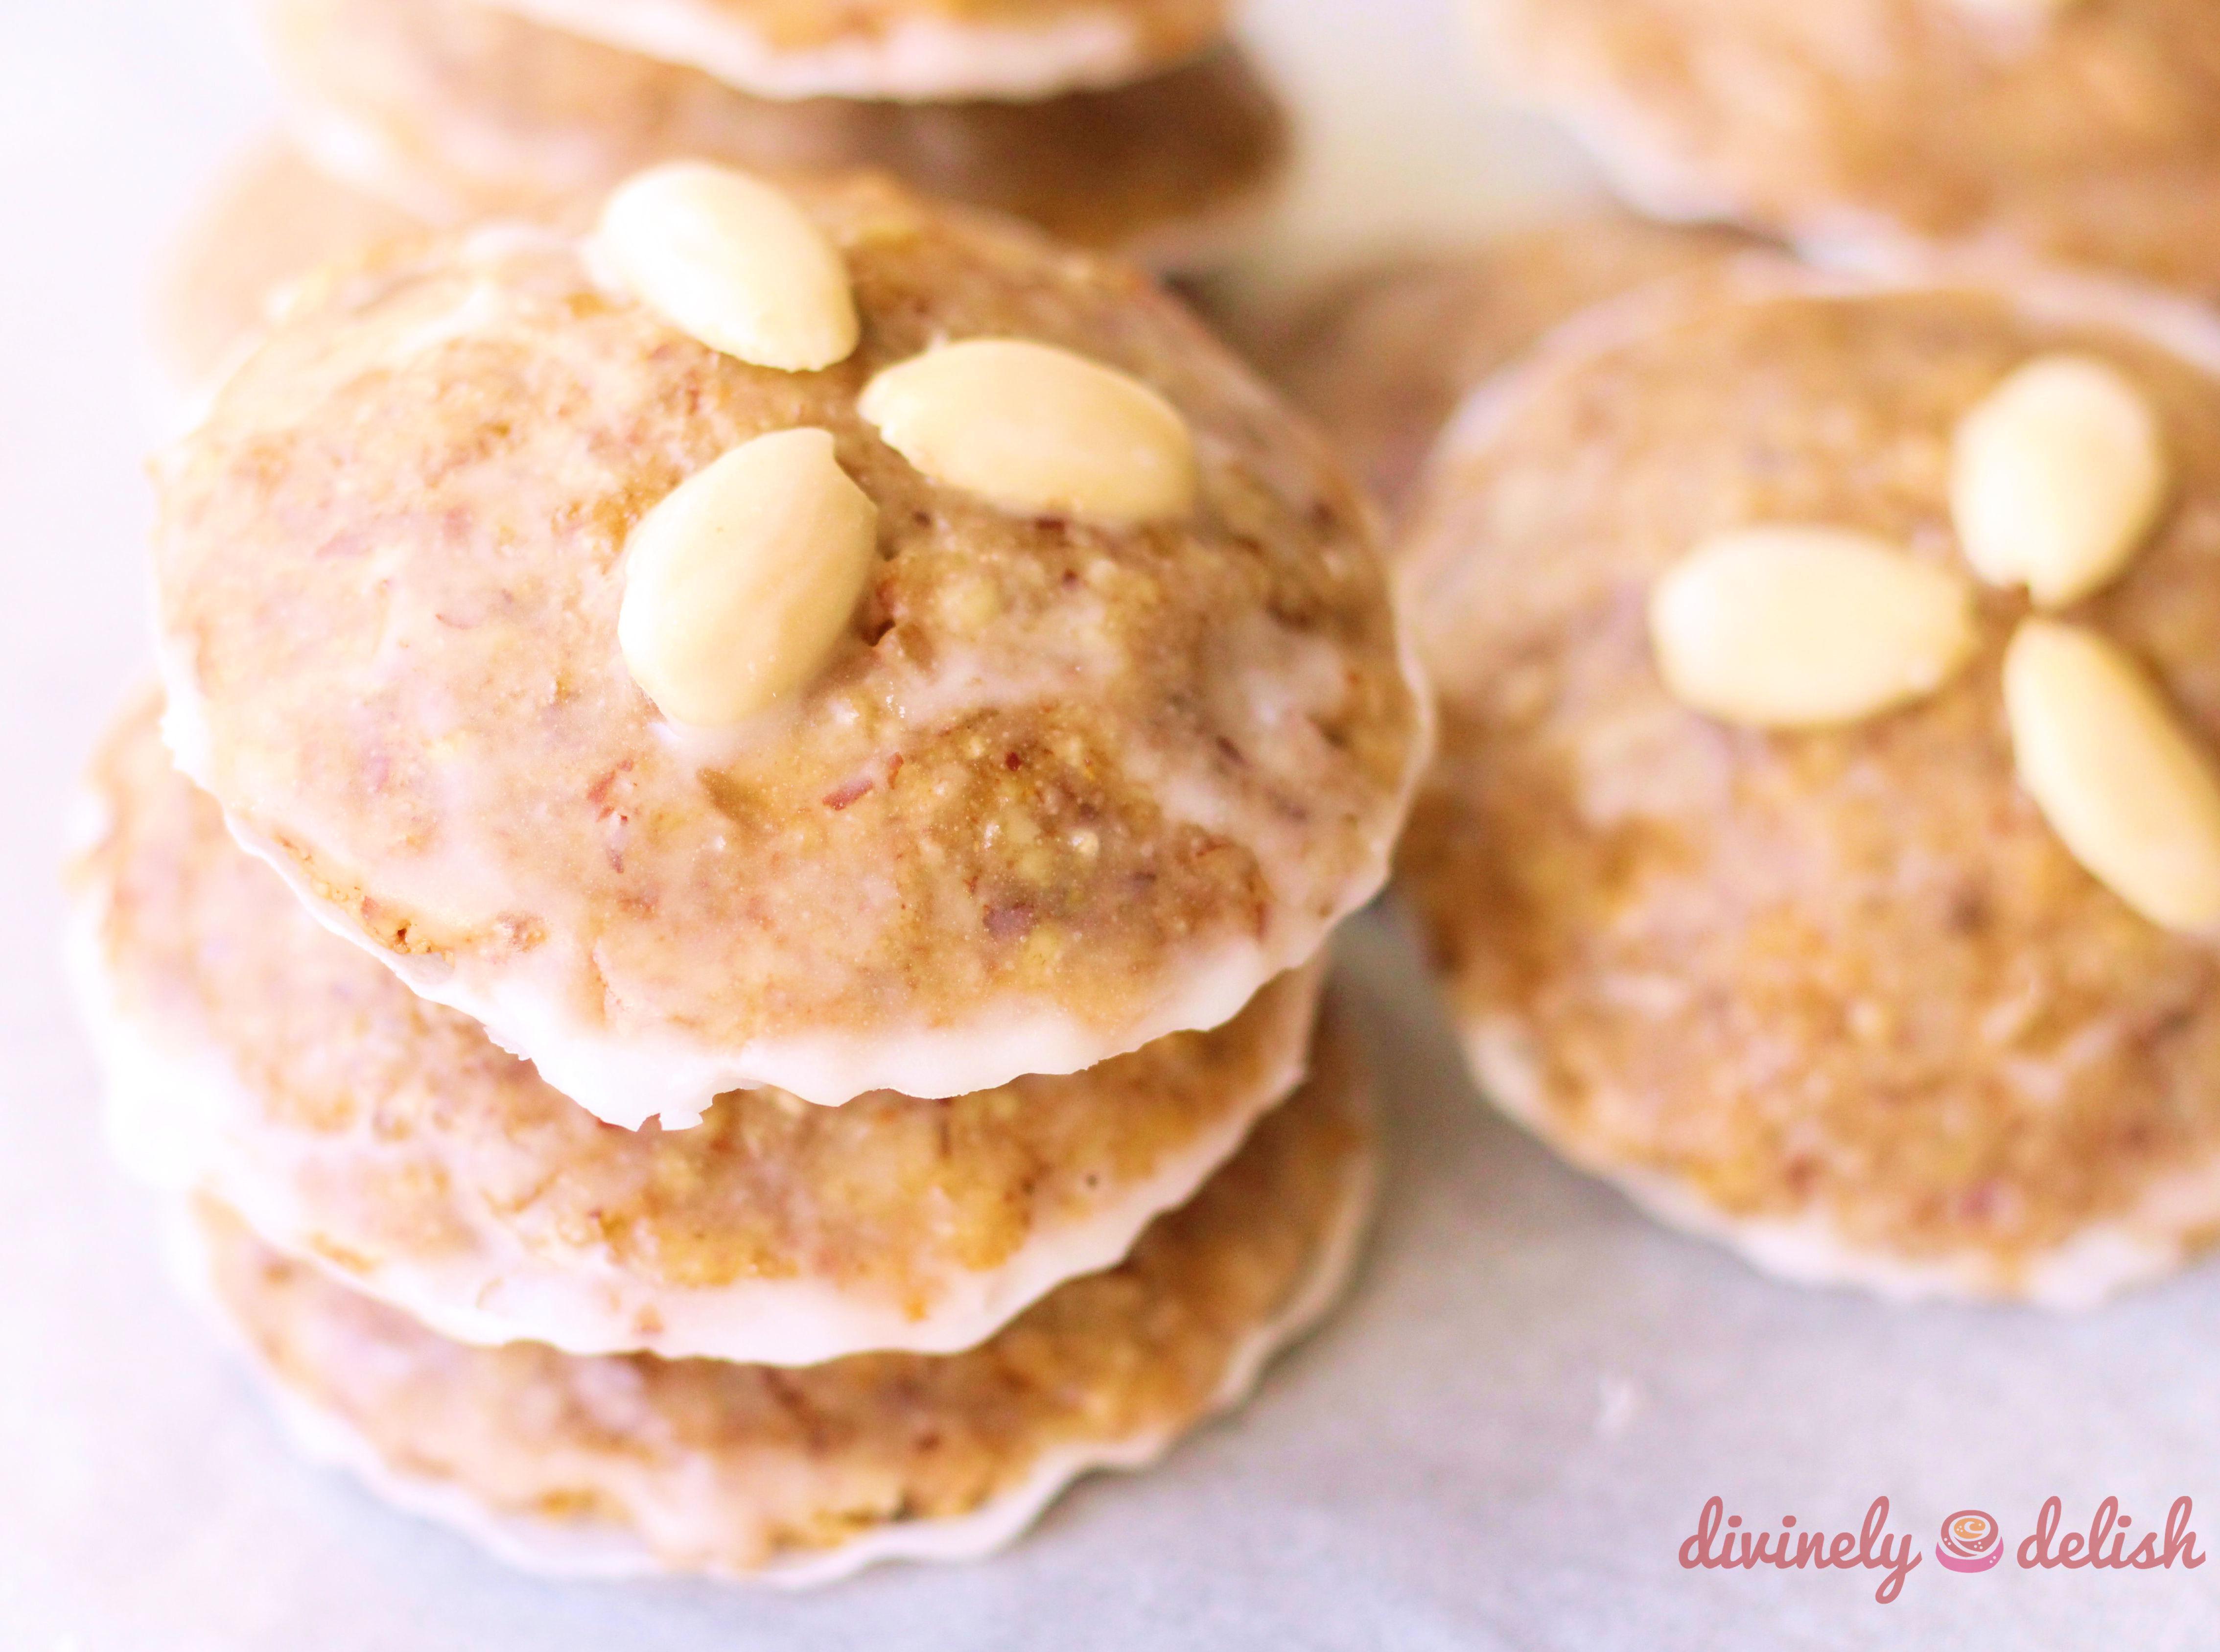 Elisenlebkuchen German Gingerbread Cookies Divinely Delish